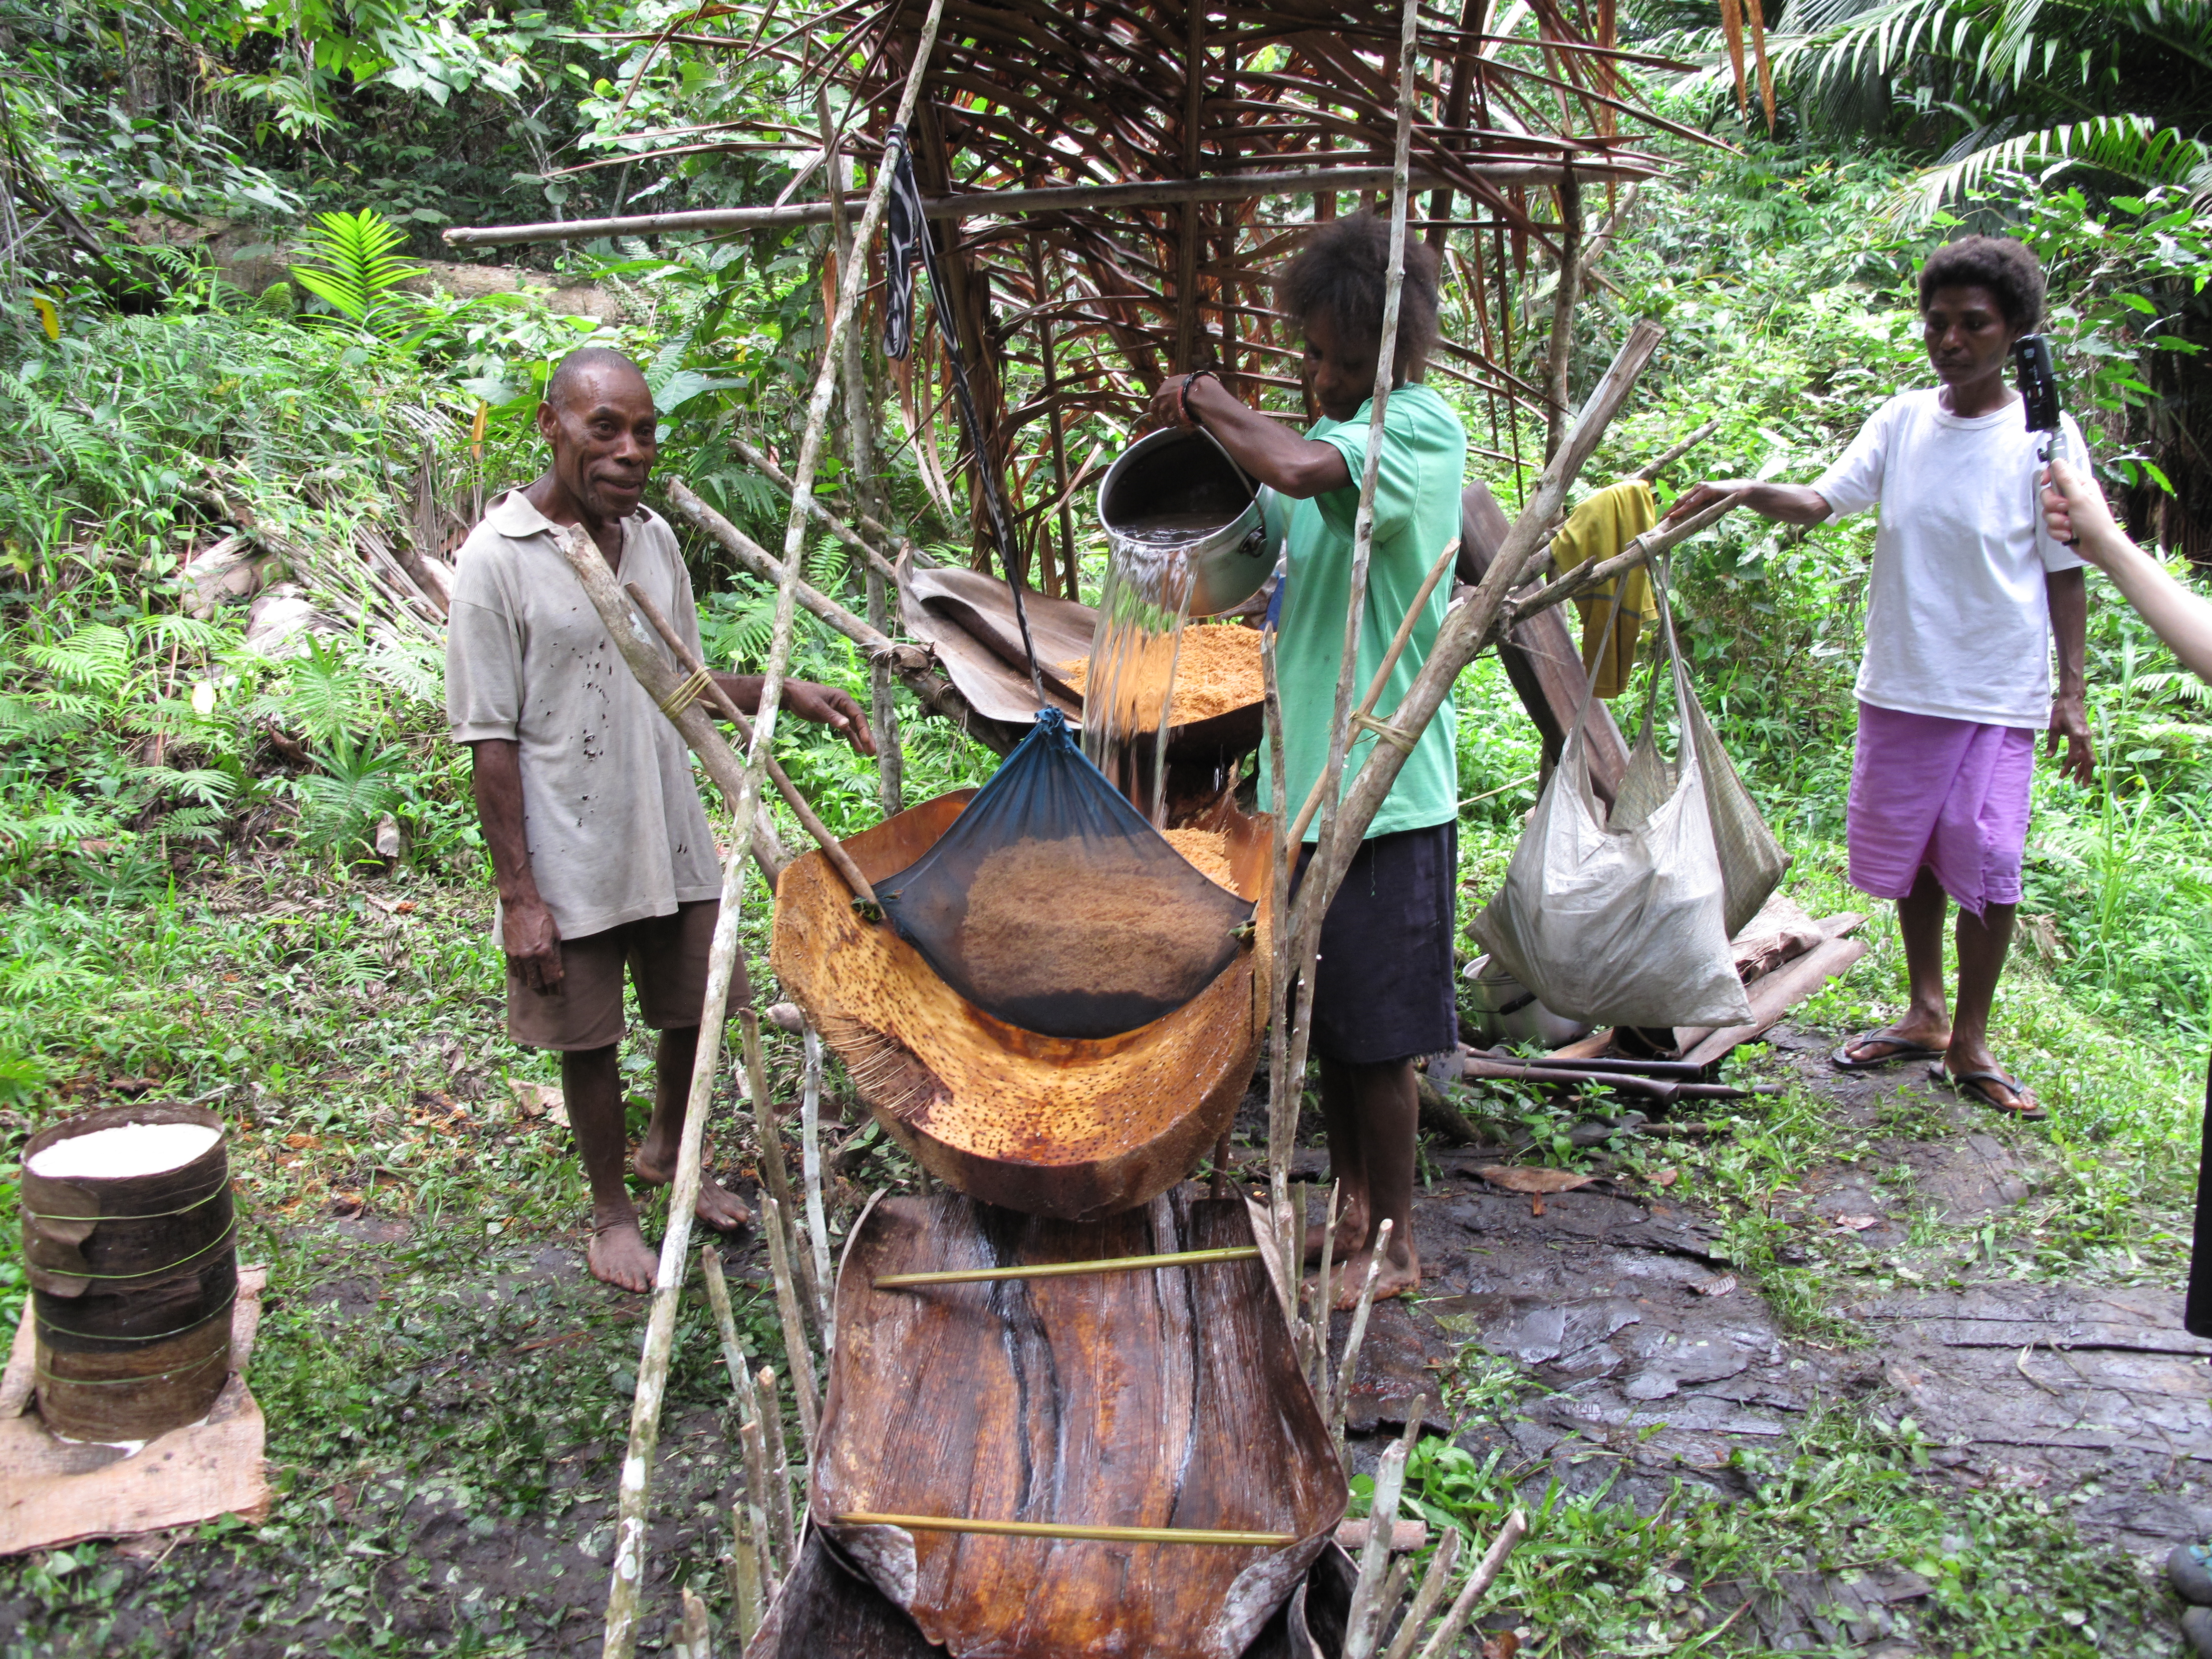 Washing sago with the traditional sago platform, /wuge sinyeq/.